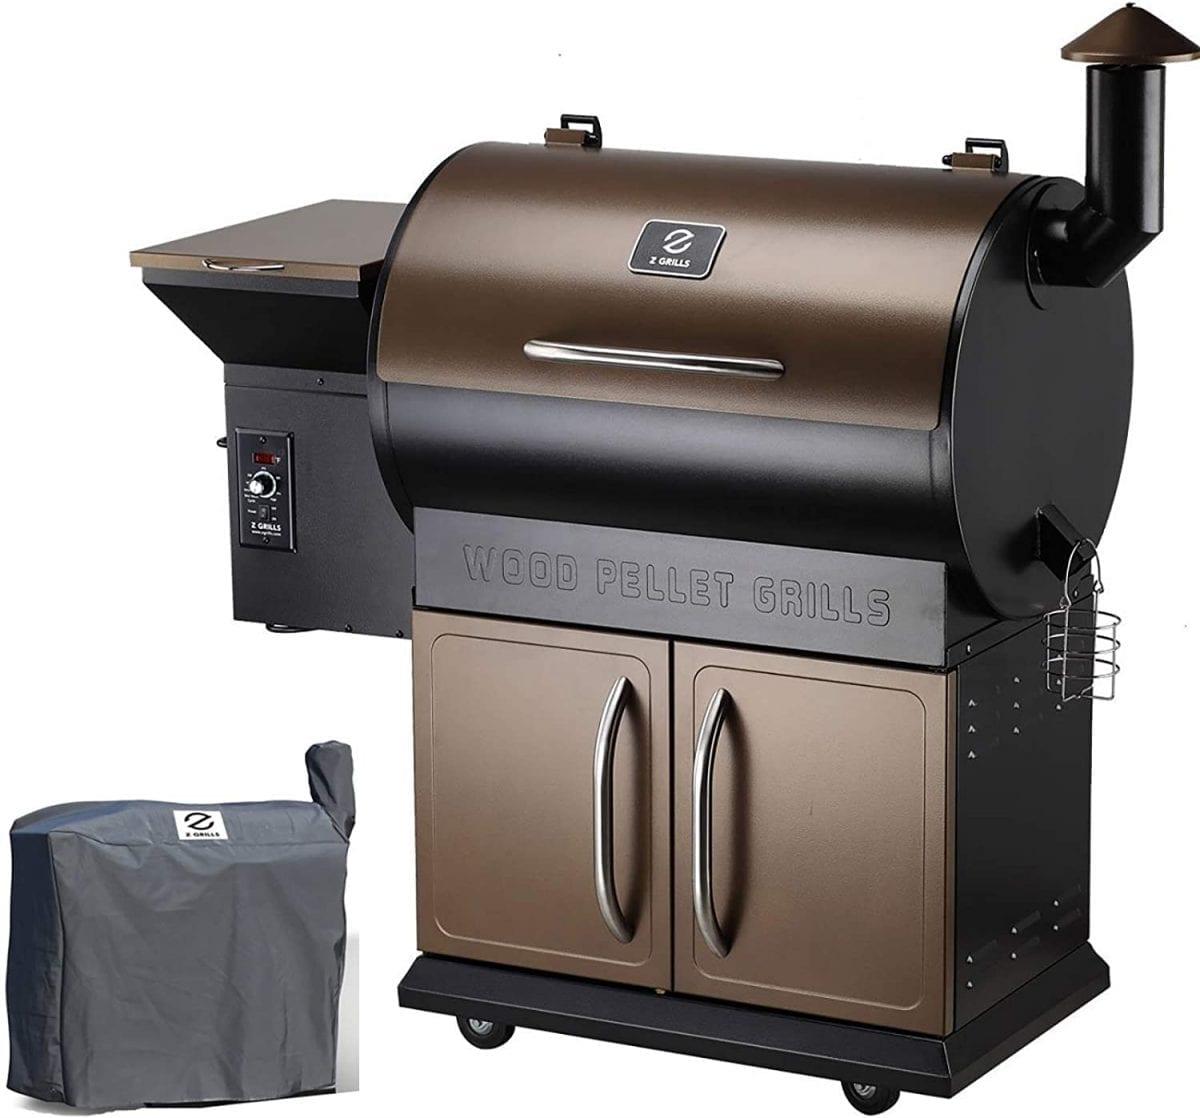 Z GRILLS 700D Wood Pellet Grill & Smoker